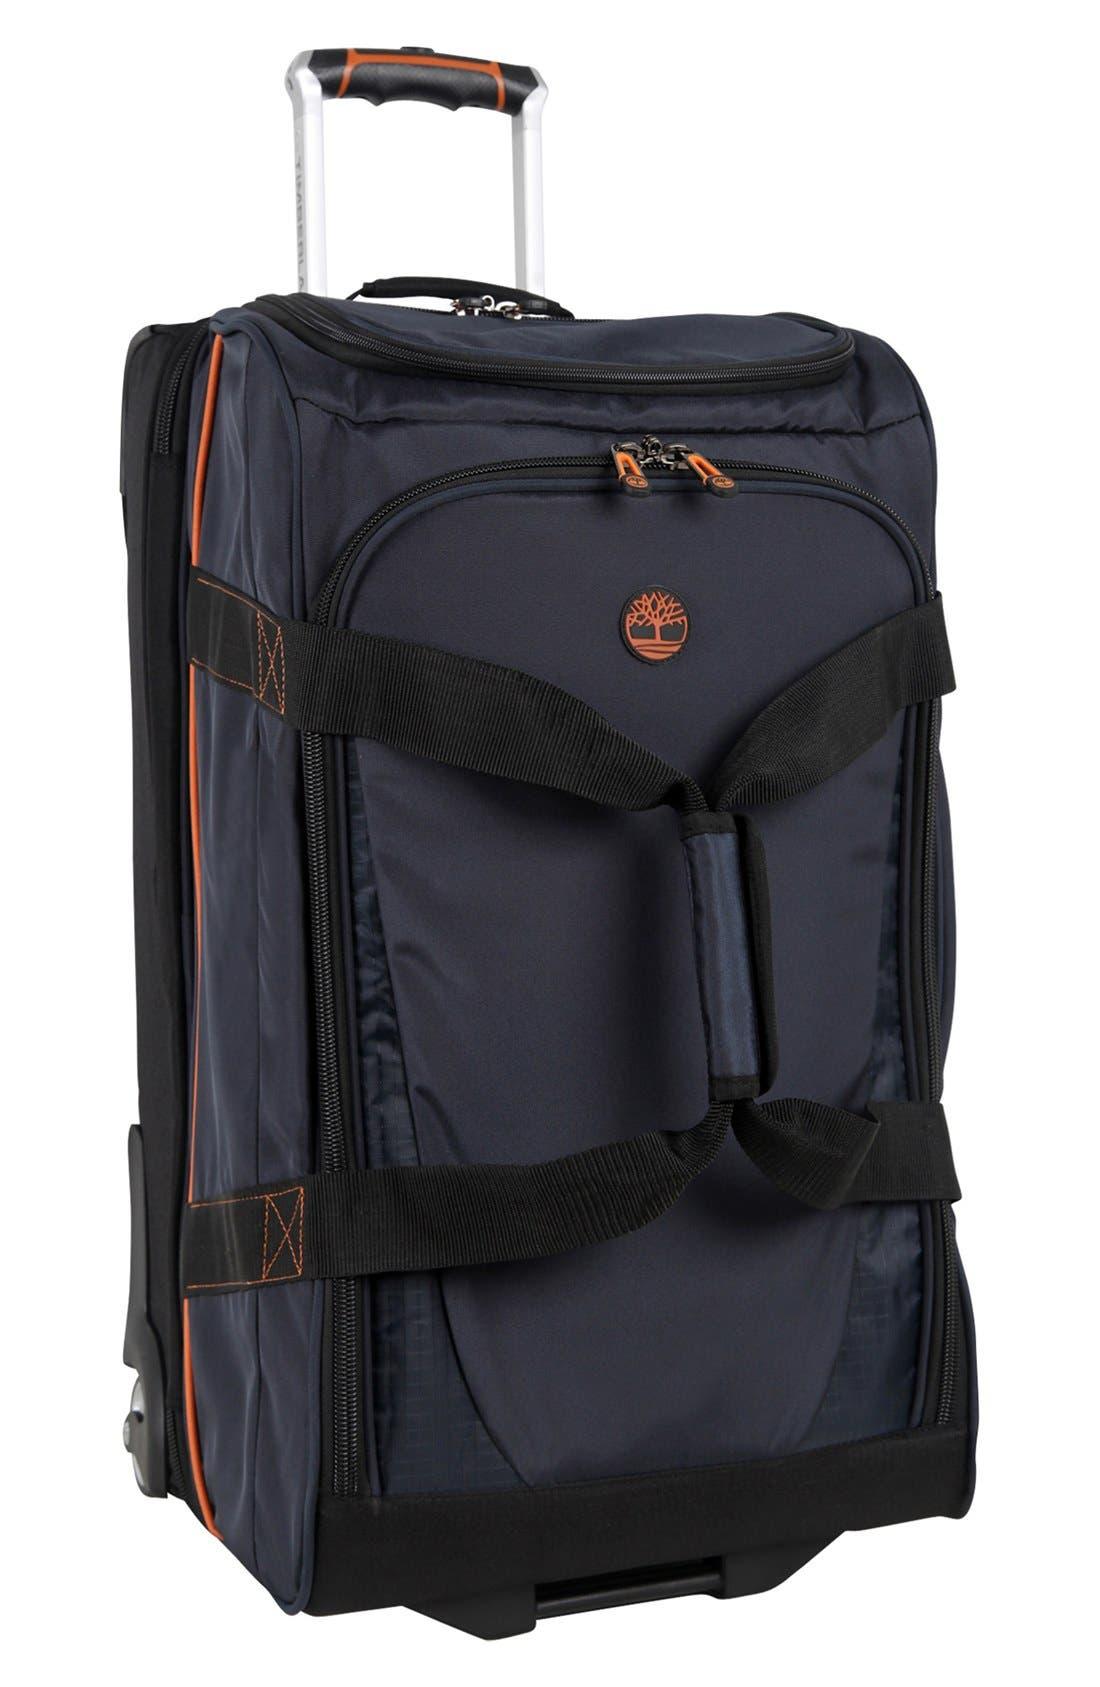 Main Image - Timberland 'Mascoma' Rolling Duffel Bag (26 Inch)